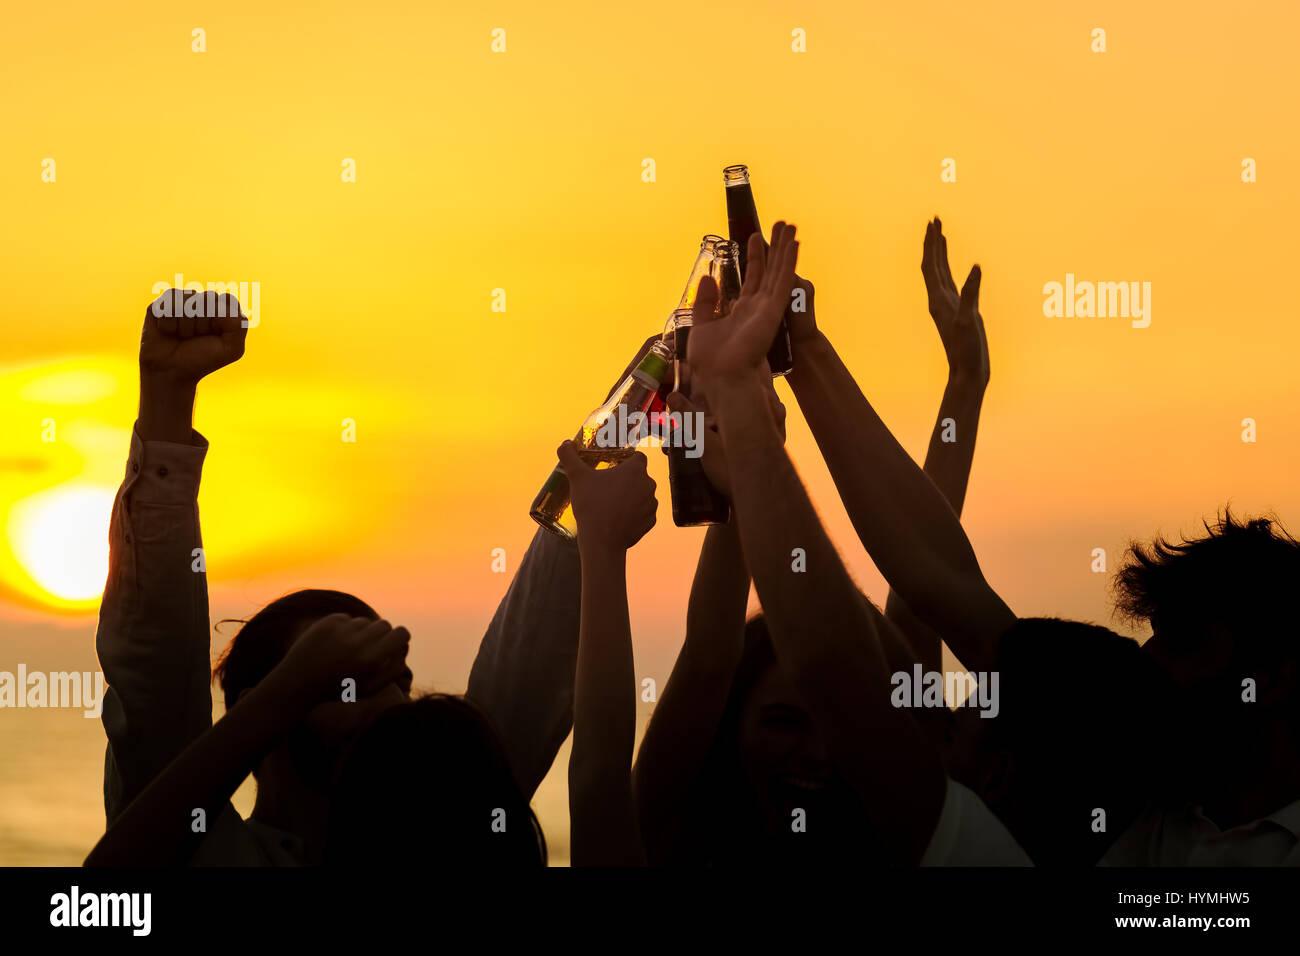 Amigos bebidas Beach Party brindis celebración concepto Foto de stock